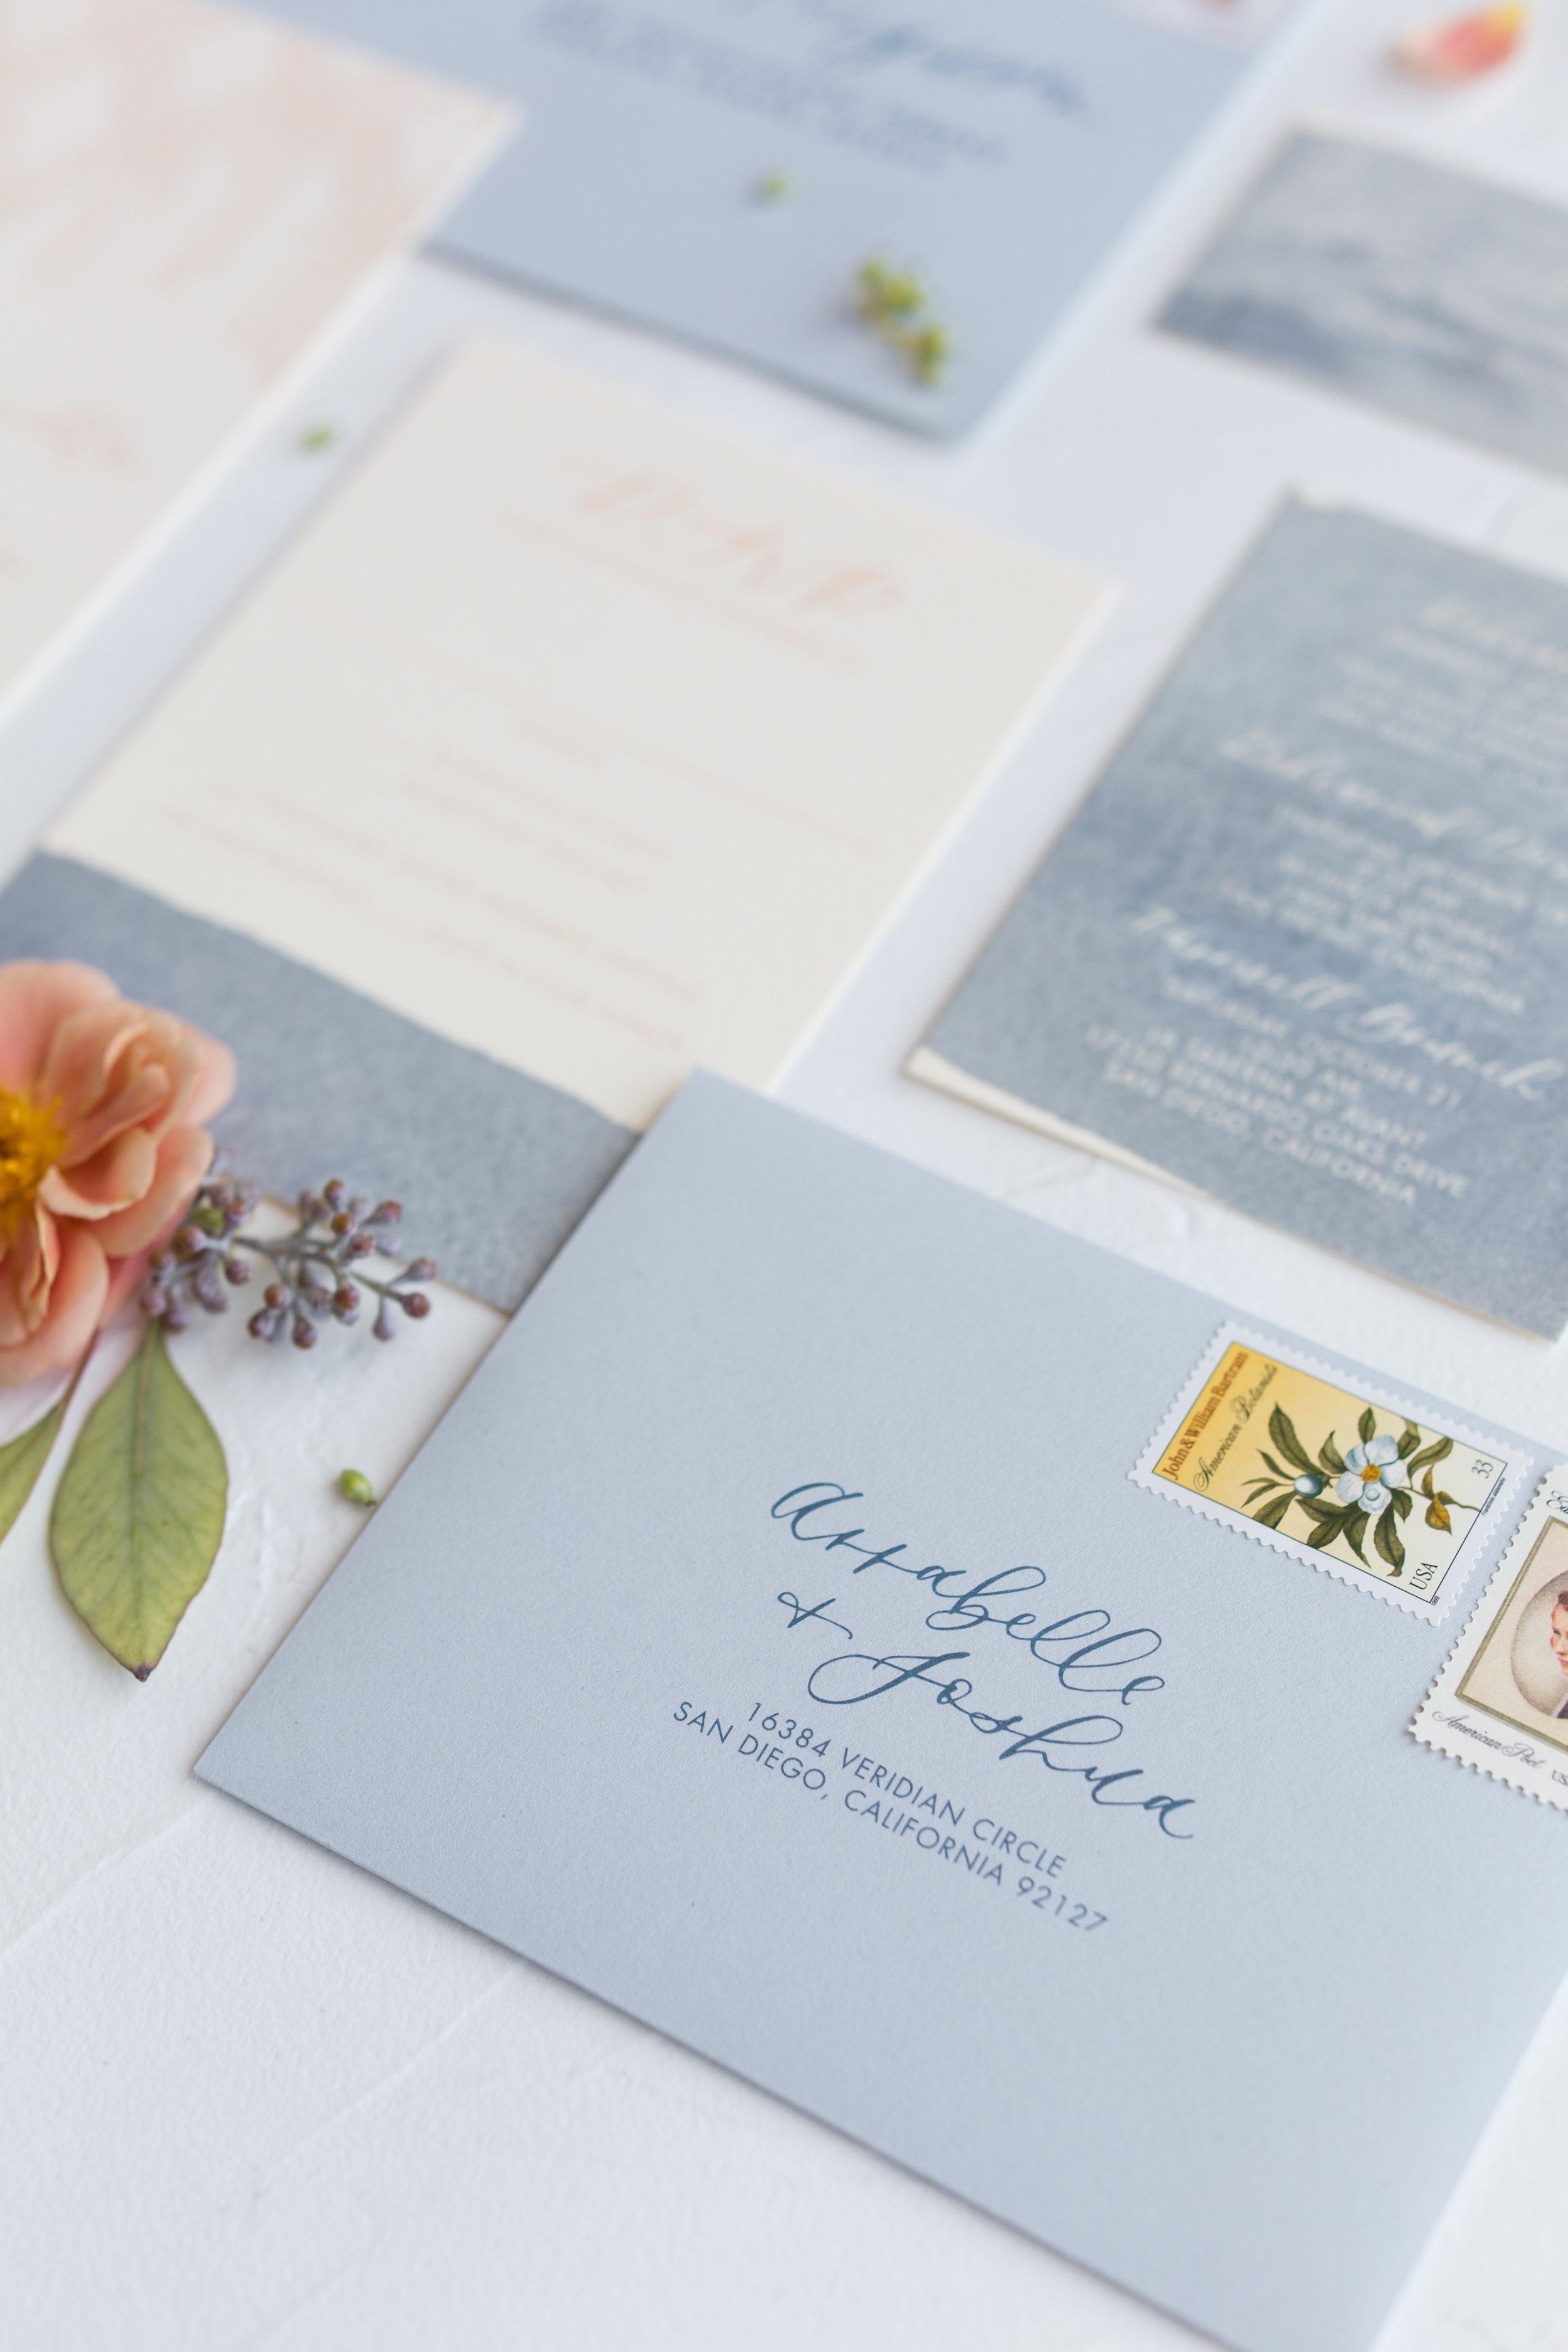 California wedding invitations